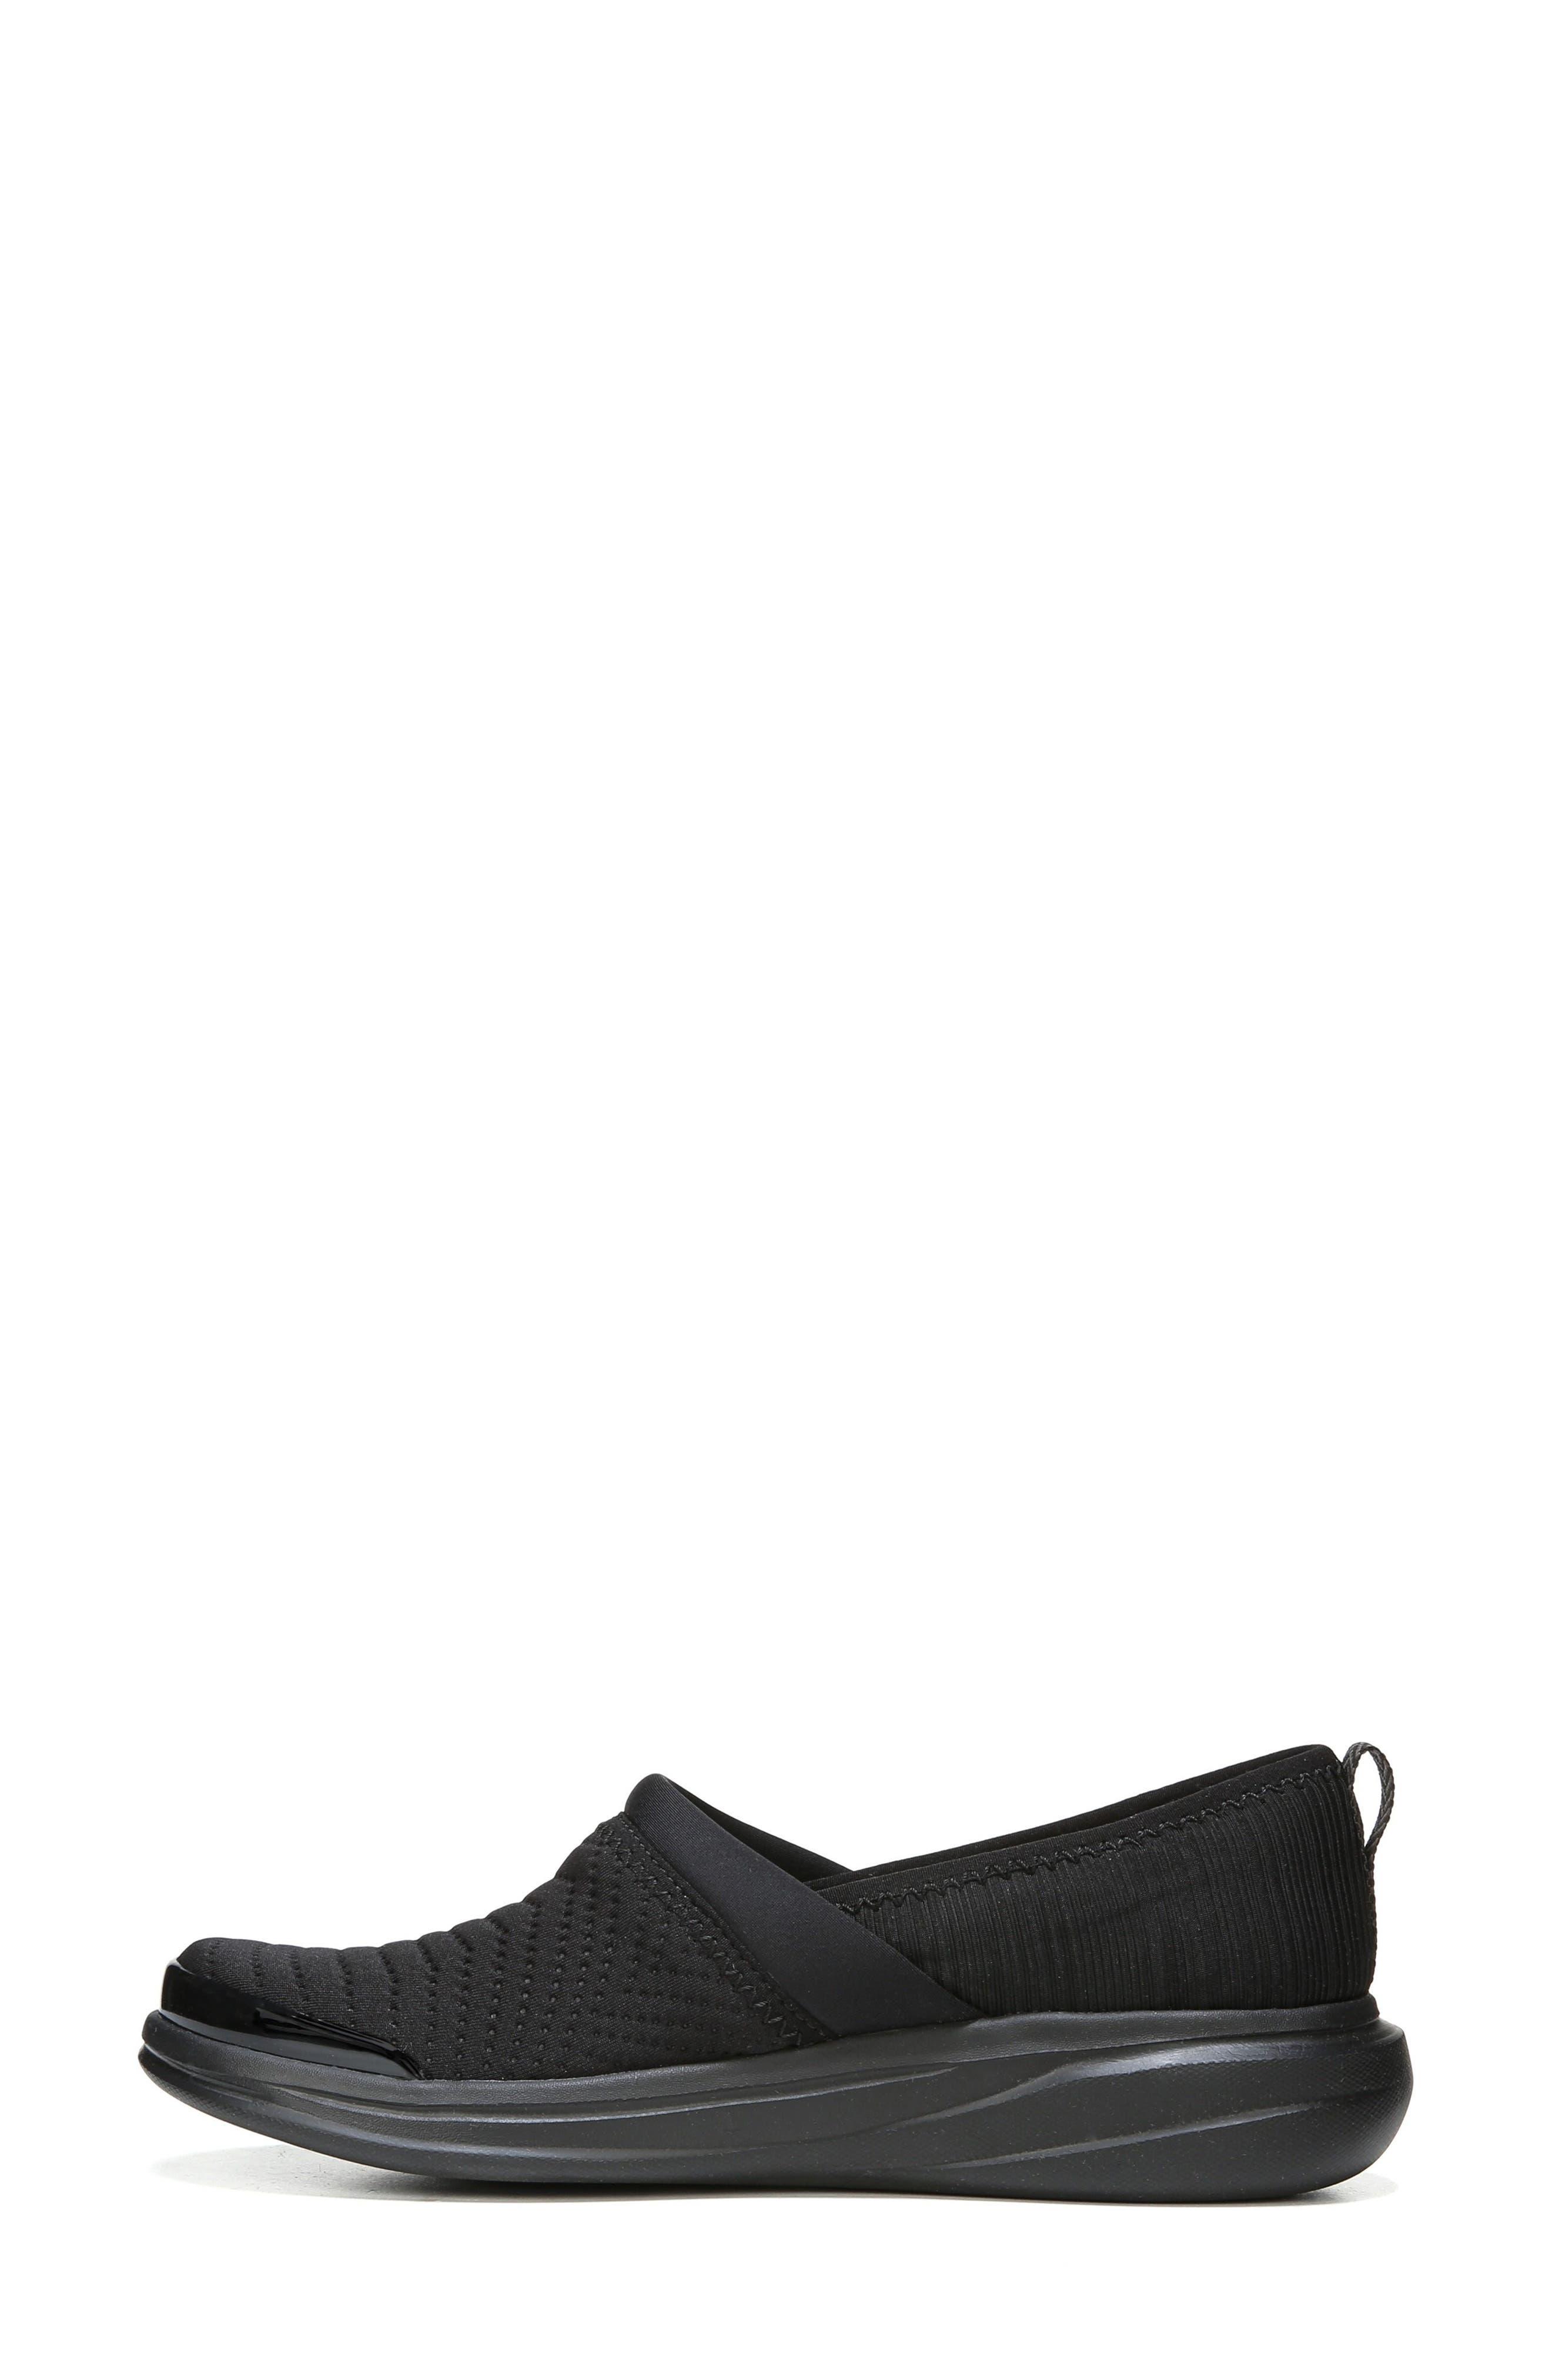 Coco Slip-On Sneaker,                             Alternate thumbnail 3, color,                             BLACK FABRIC